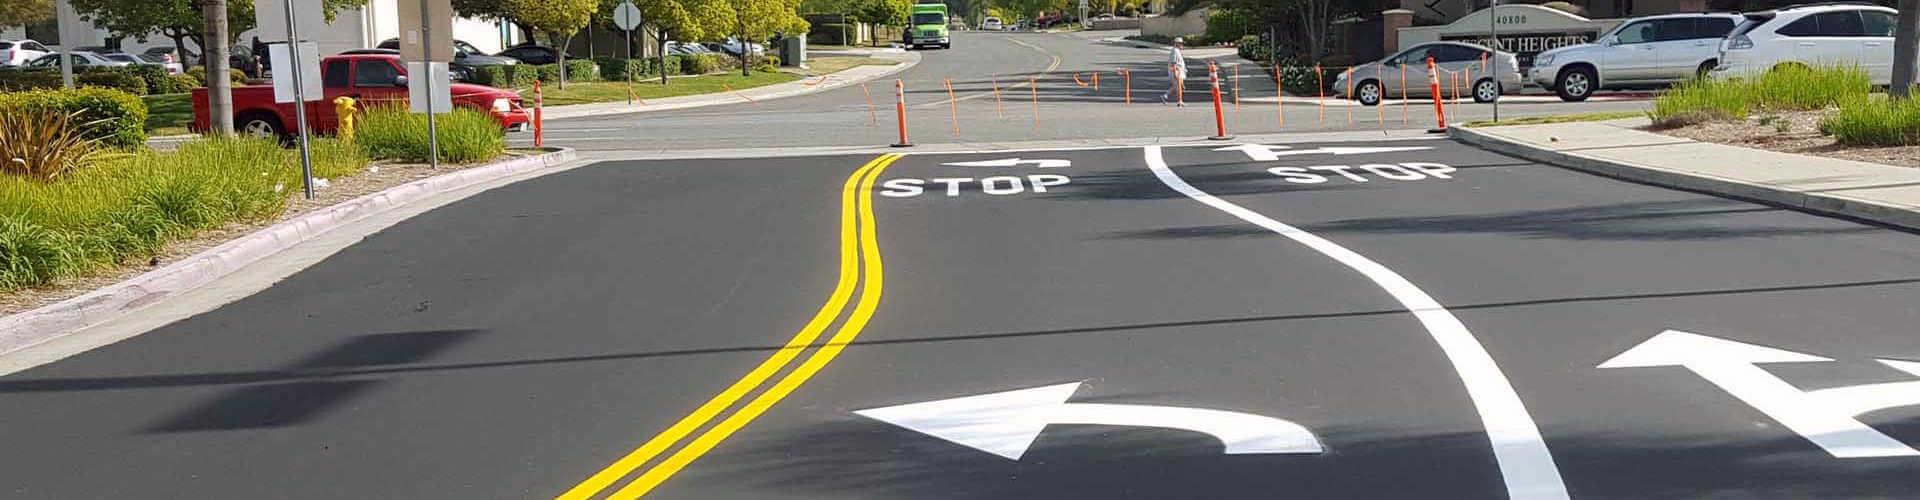 New asphalt road in Southern California